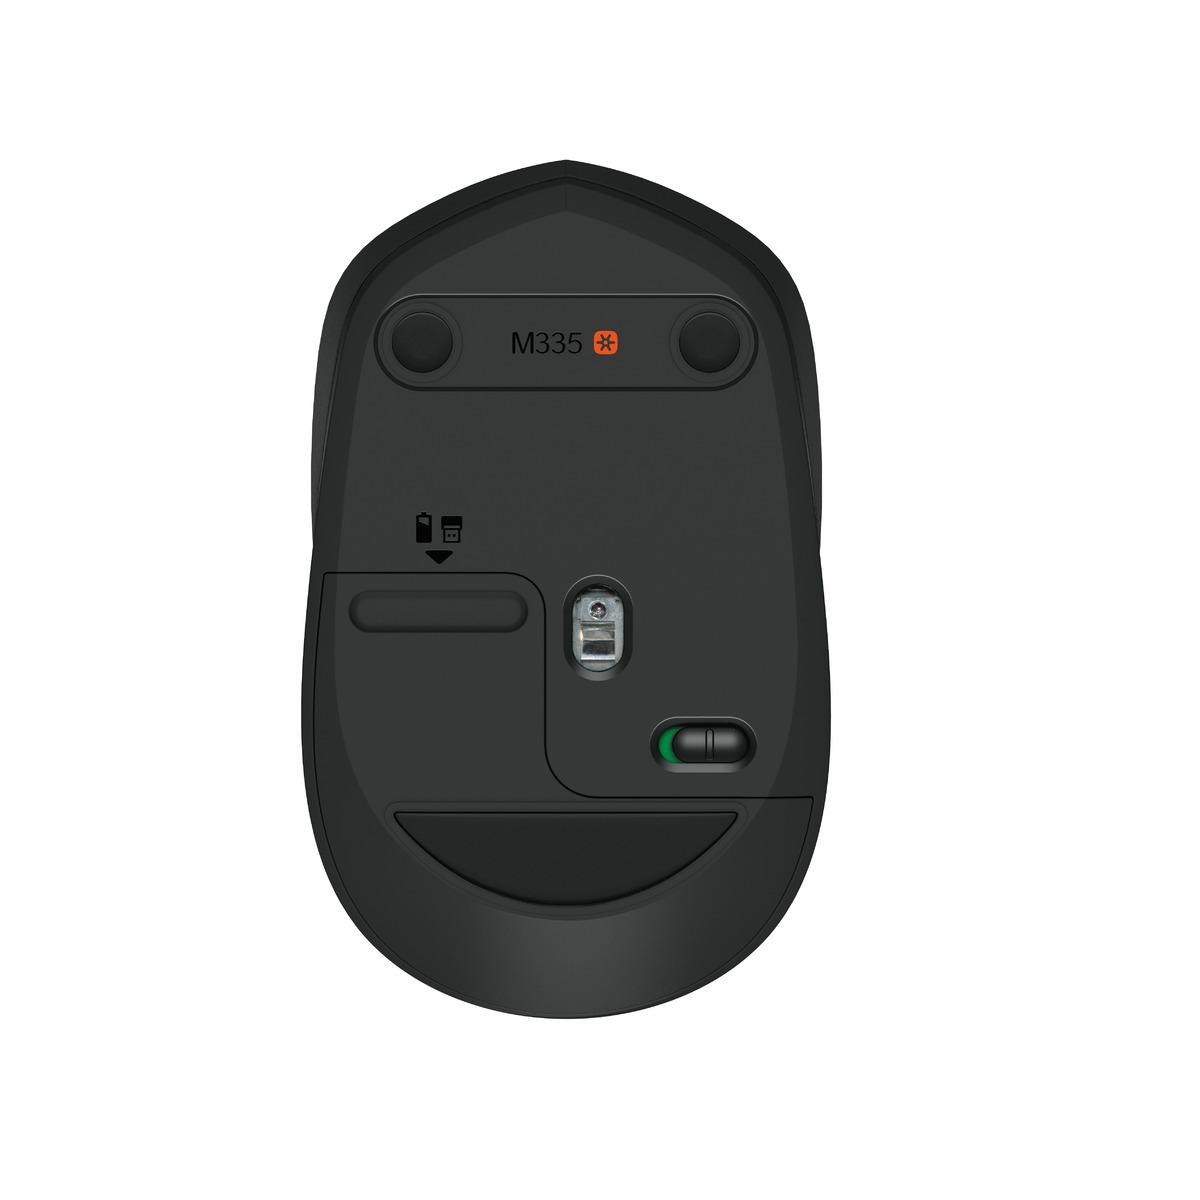 LOGITECH M335 Black